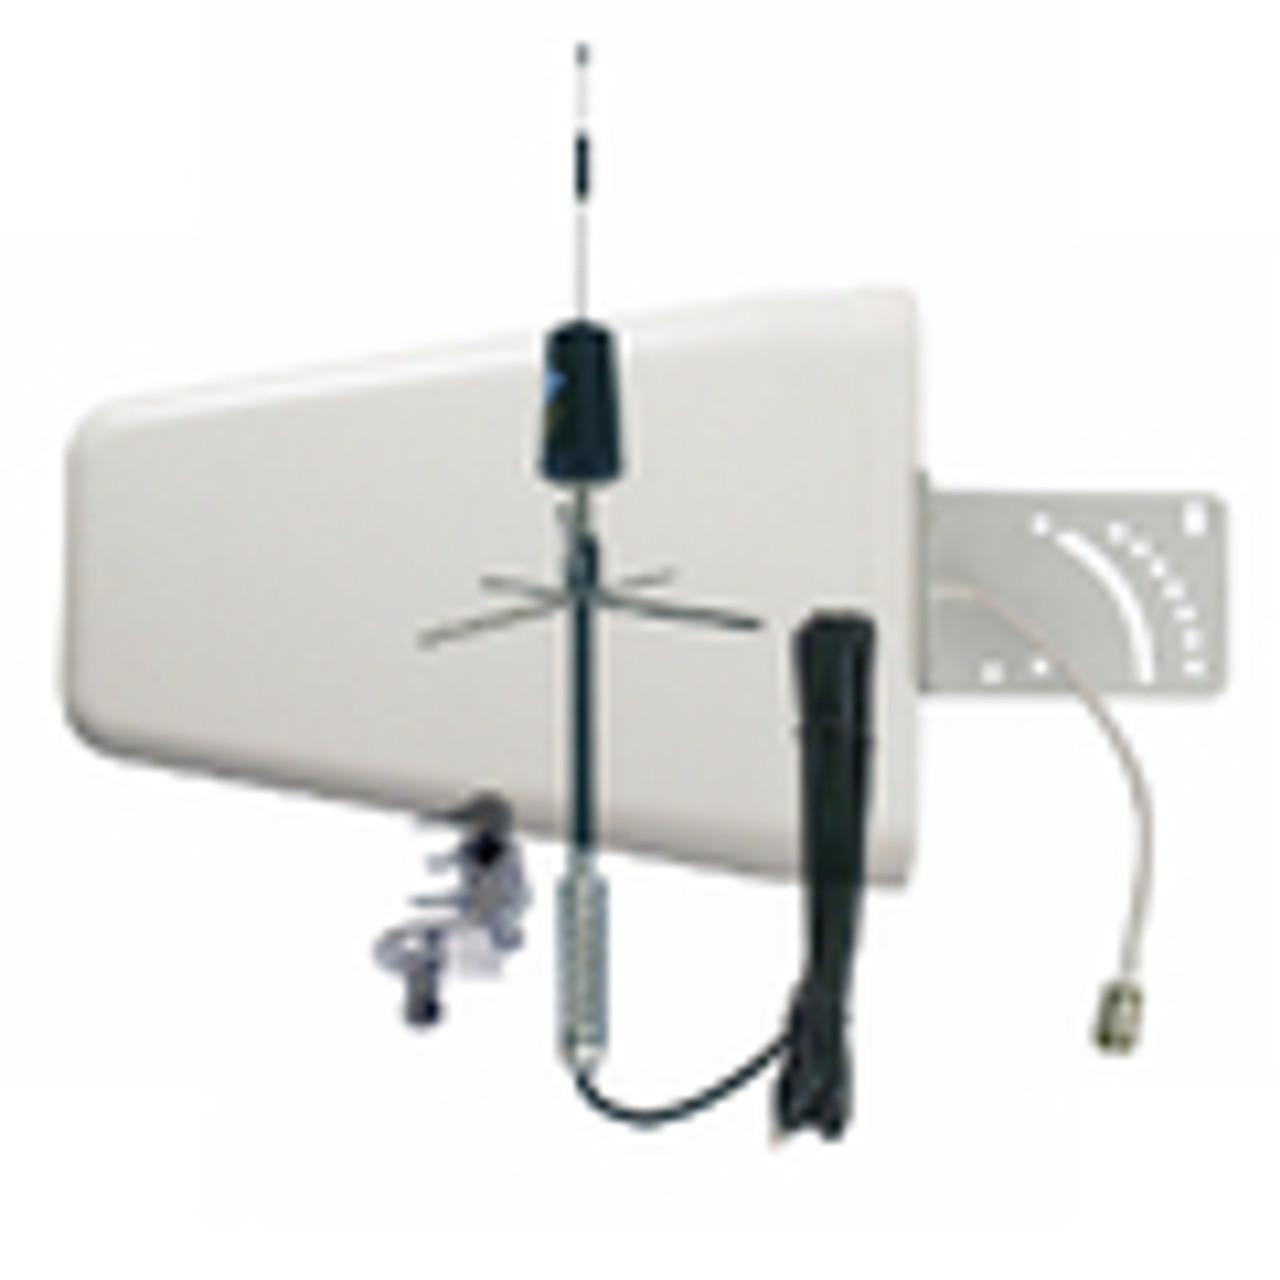 Cellular Antenna FAQ